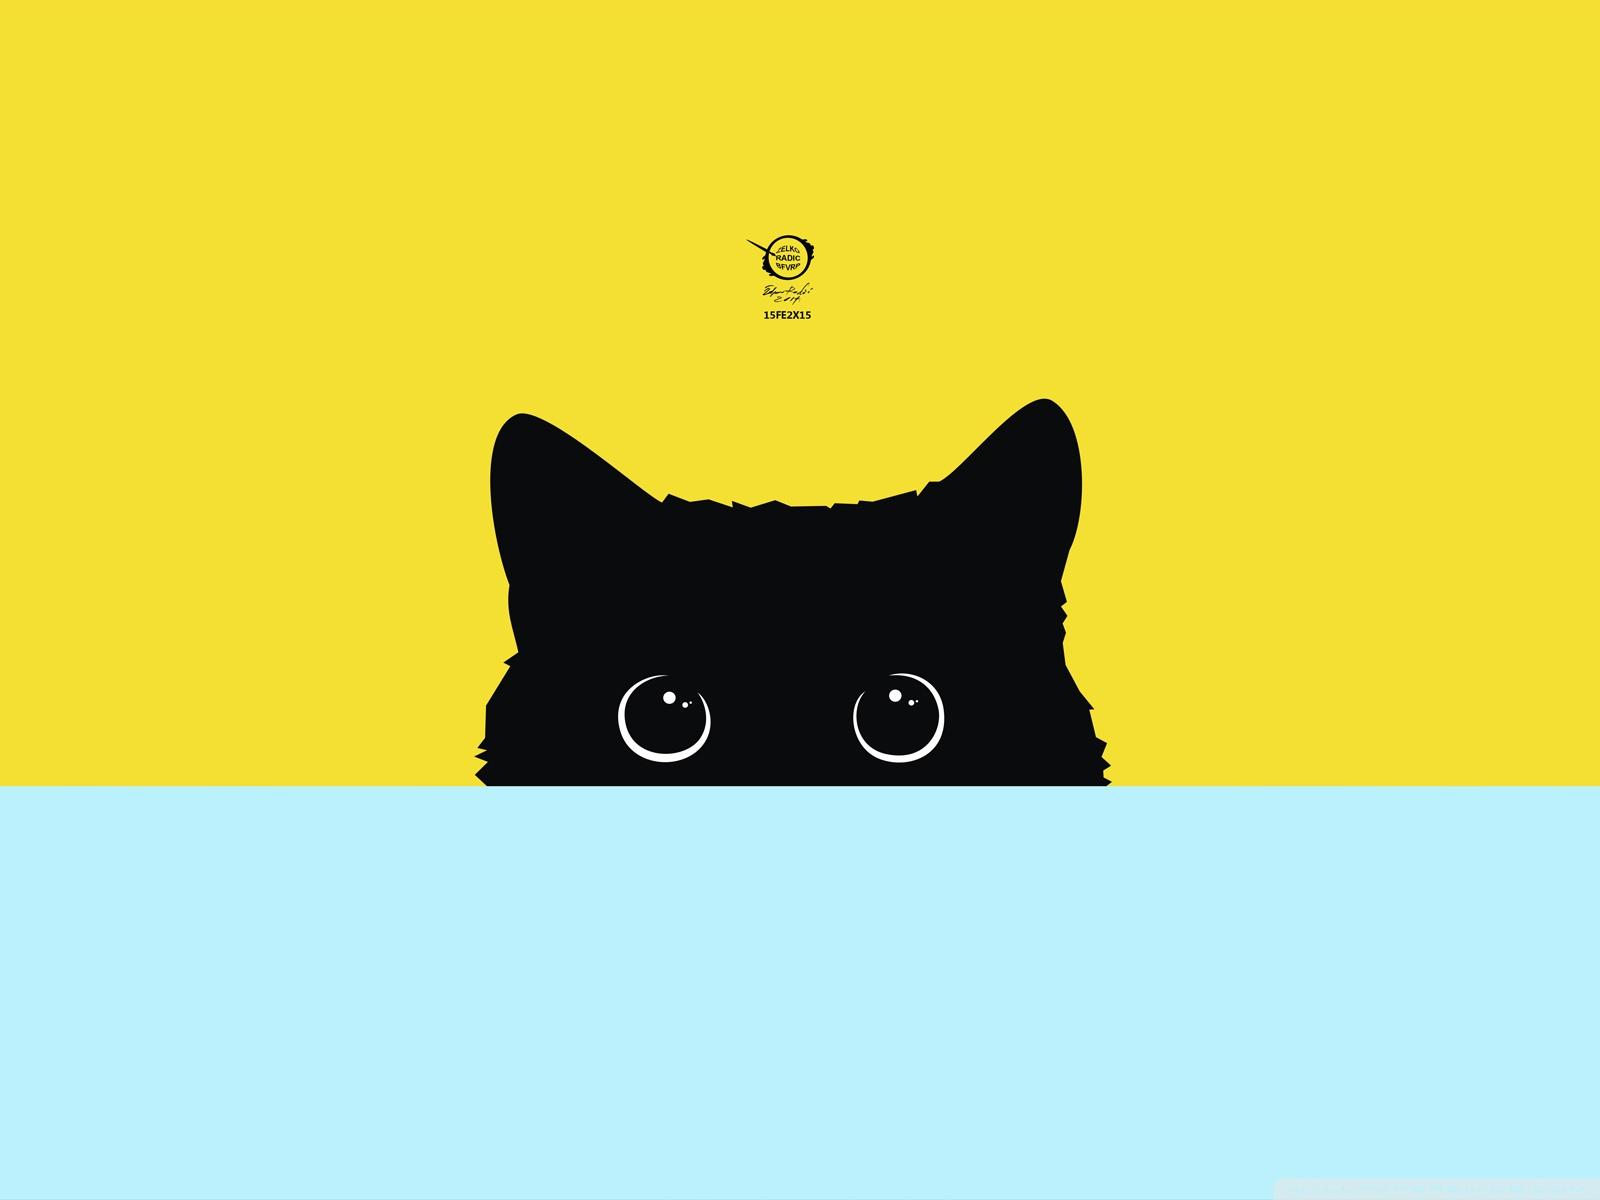 Free Kitty phone wallpaper by nascimento1